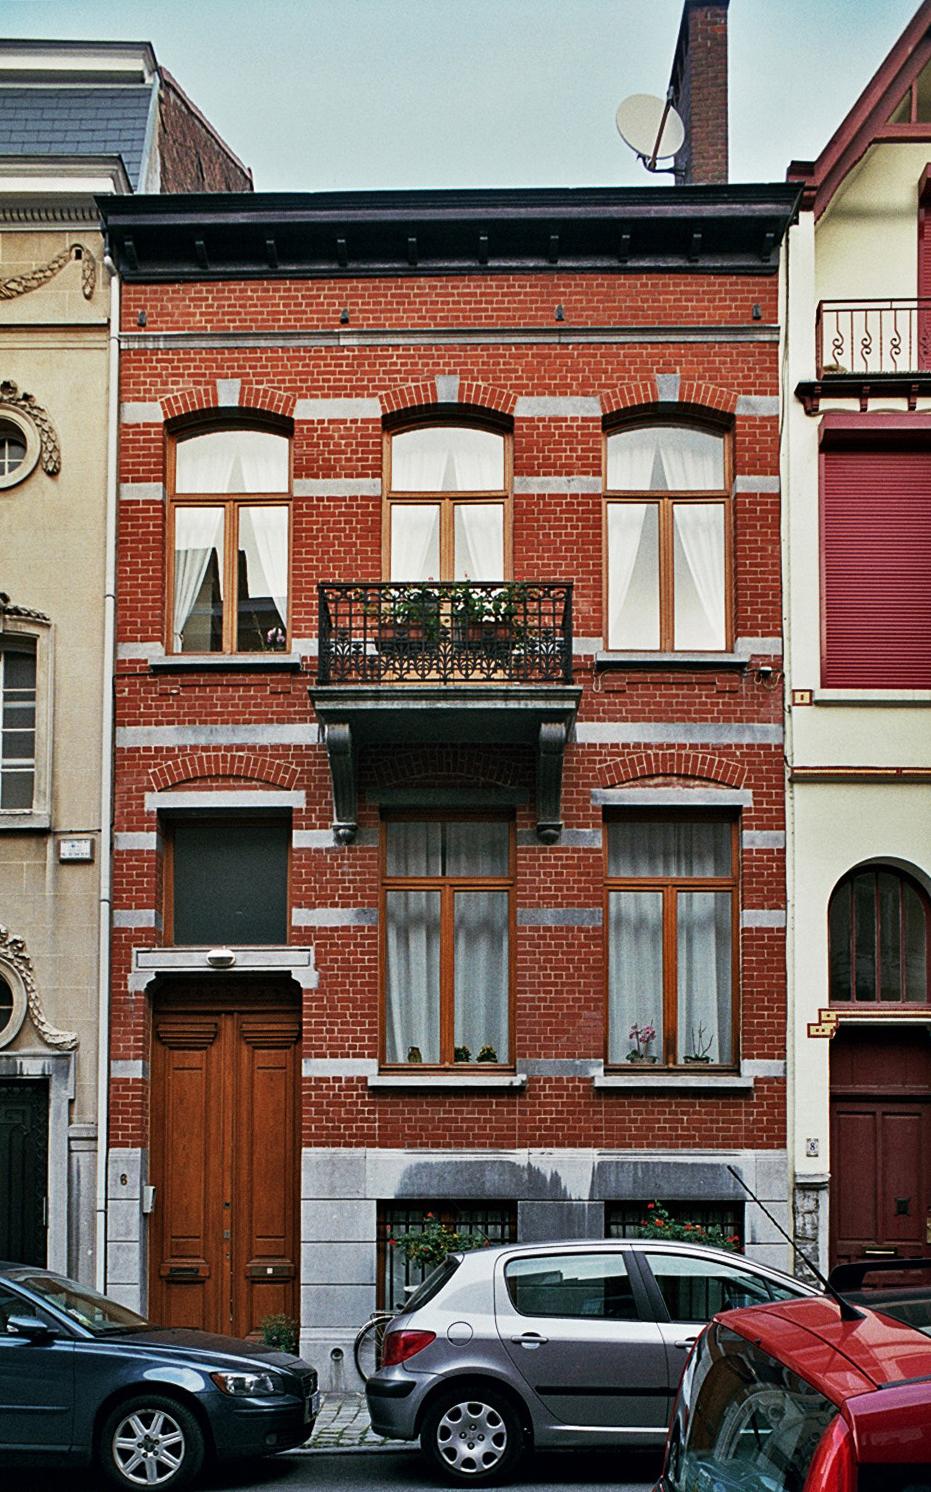 Rue Rembrandt 6., 2009